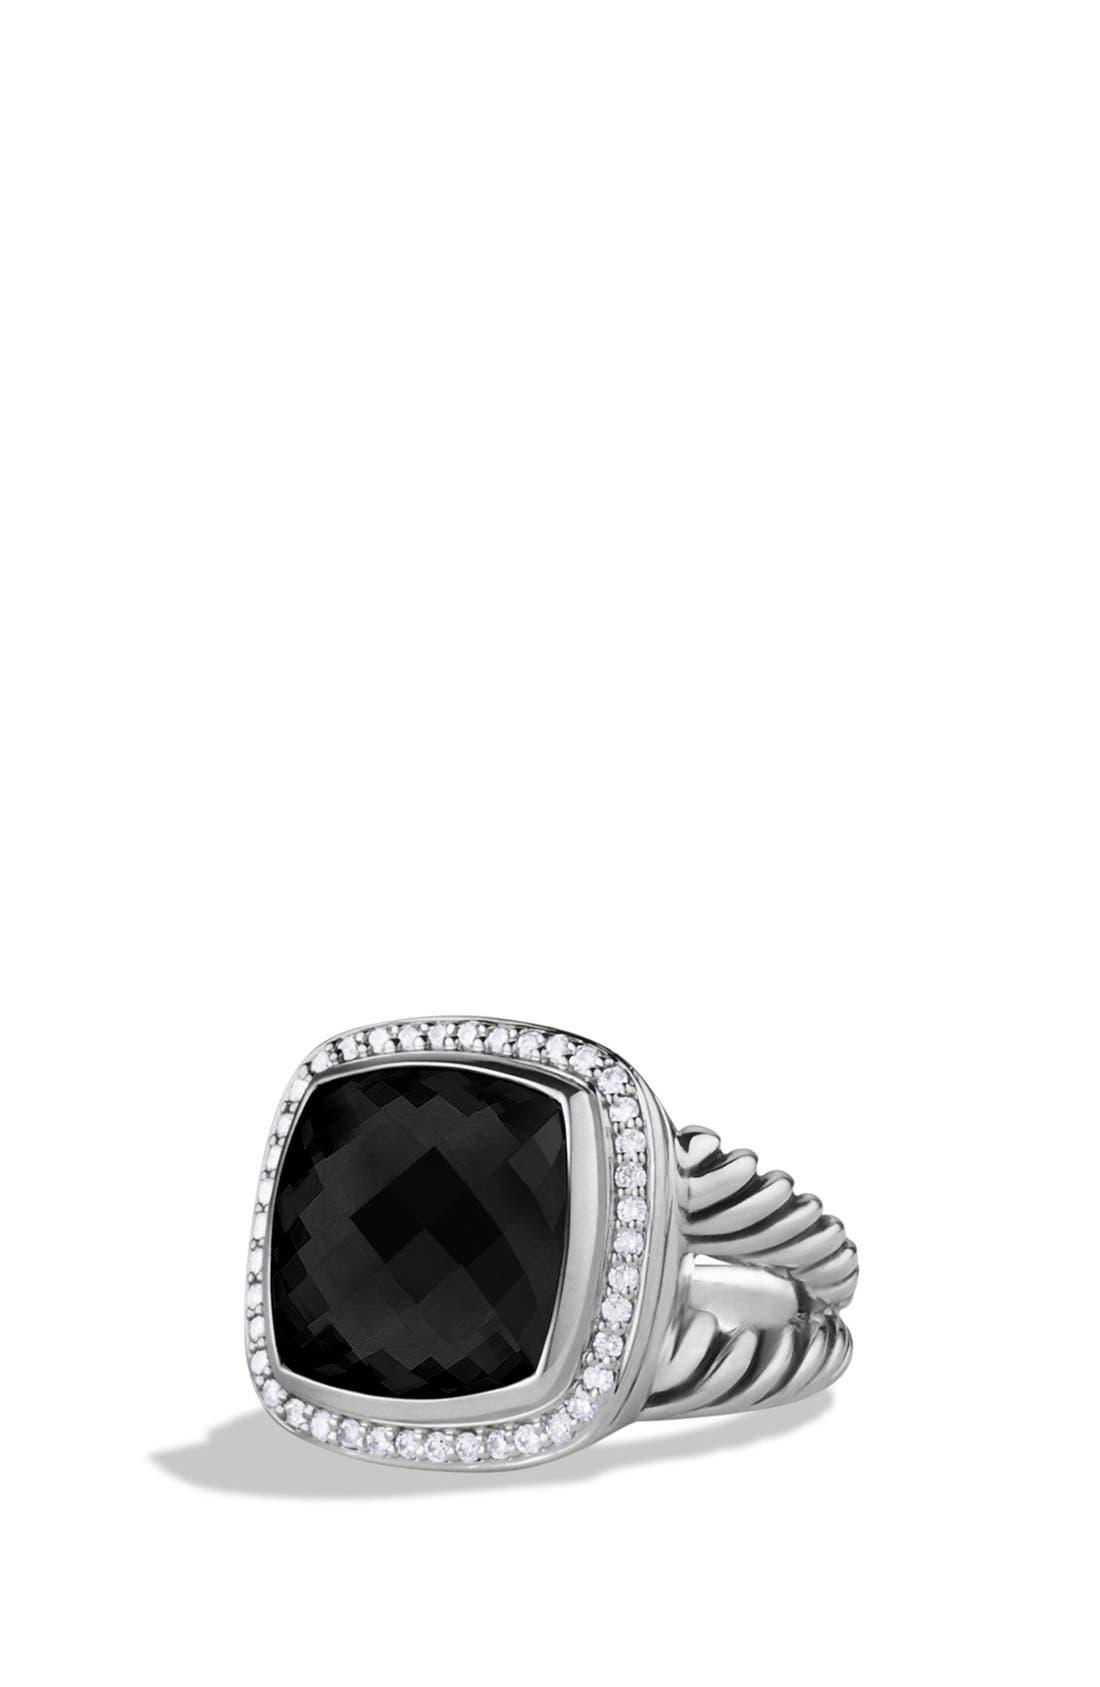 'Albion' Ring with Semiprecious Stone & Diamonds,                             Main thumbnail 1, color,                             001